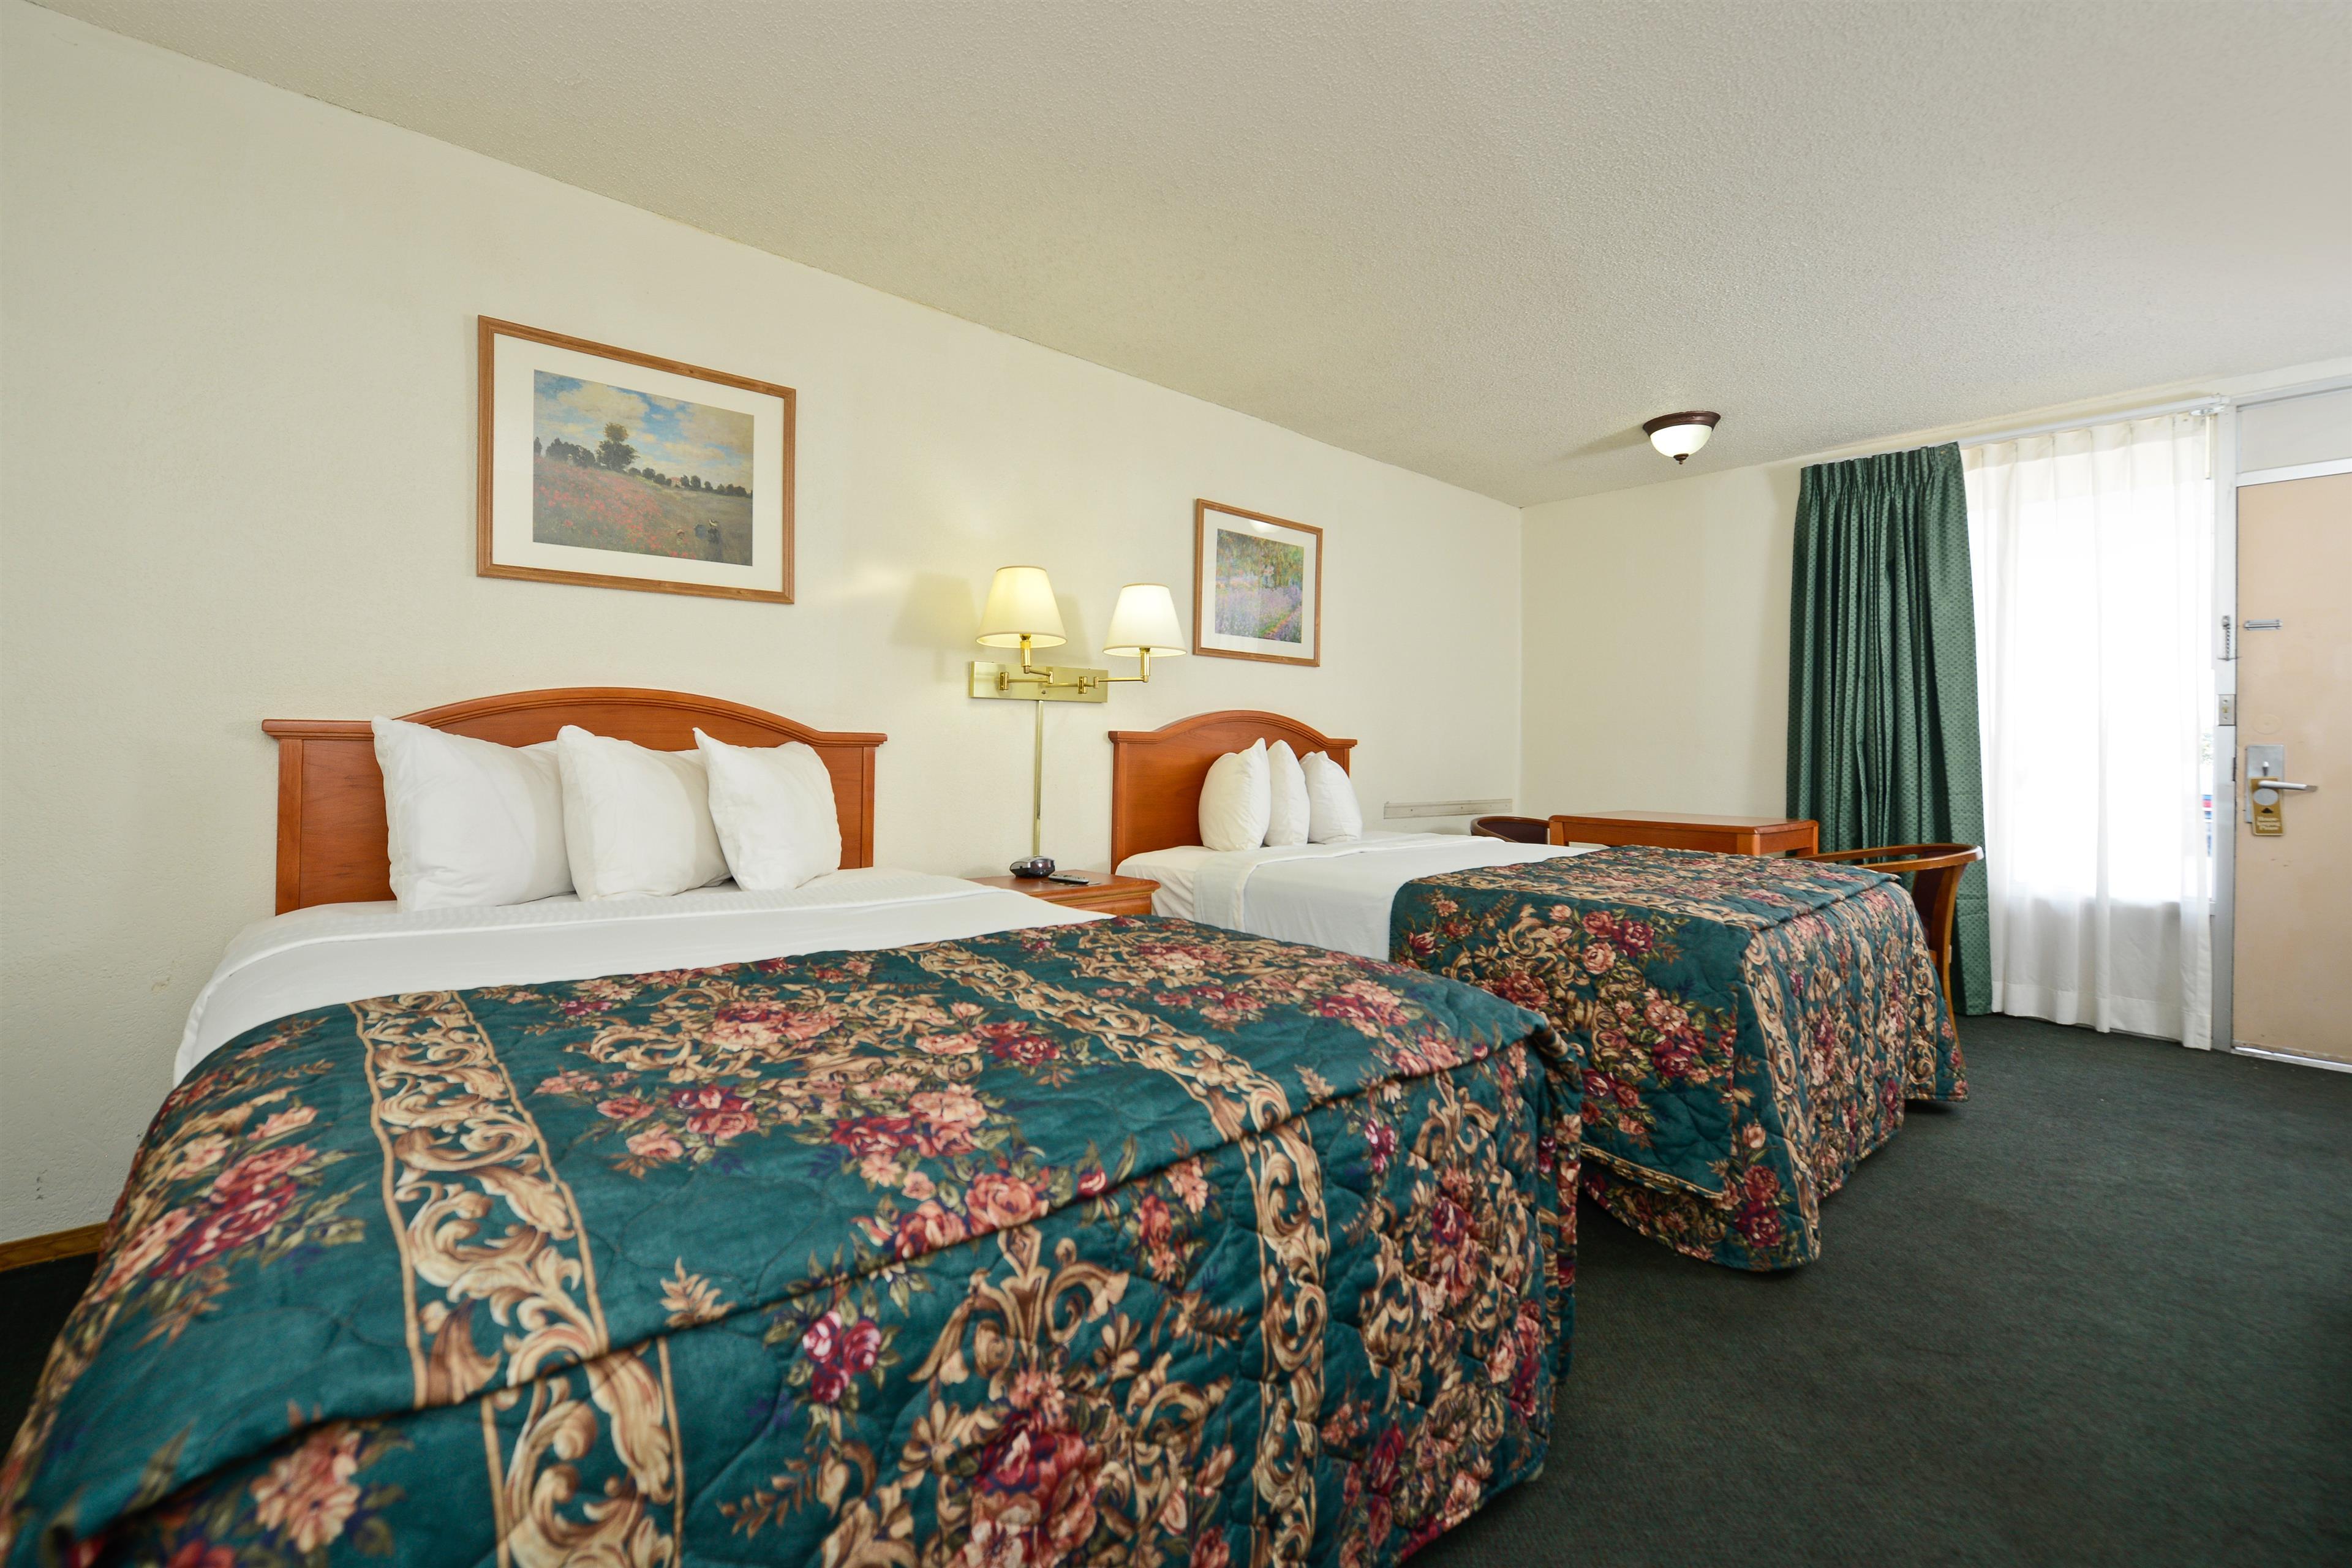 Miami Ok Hotels Motels